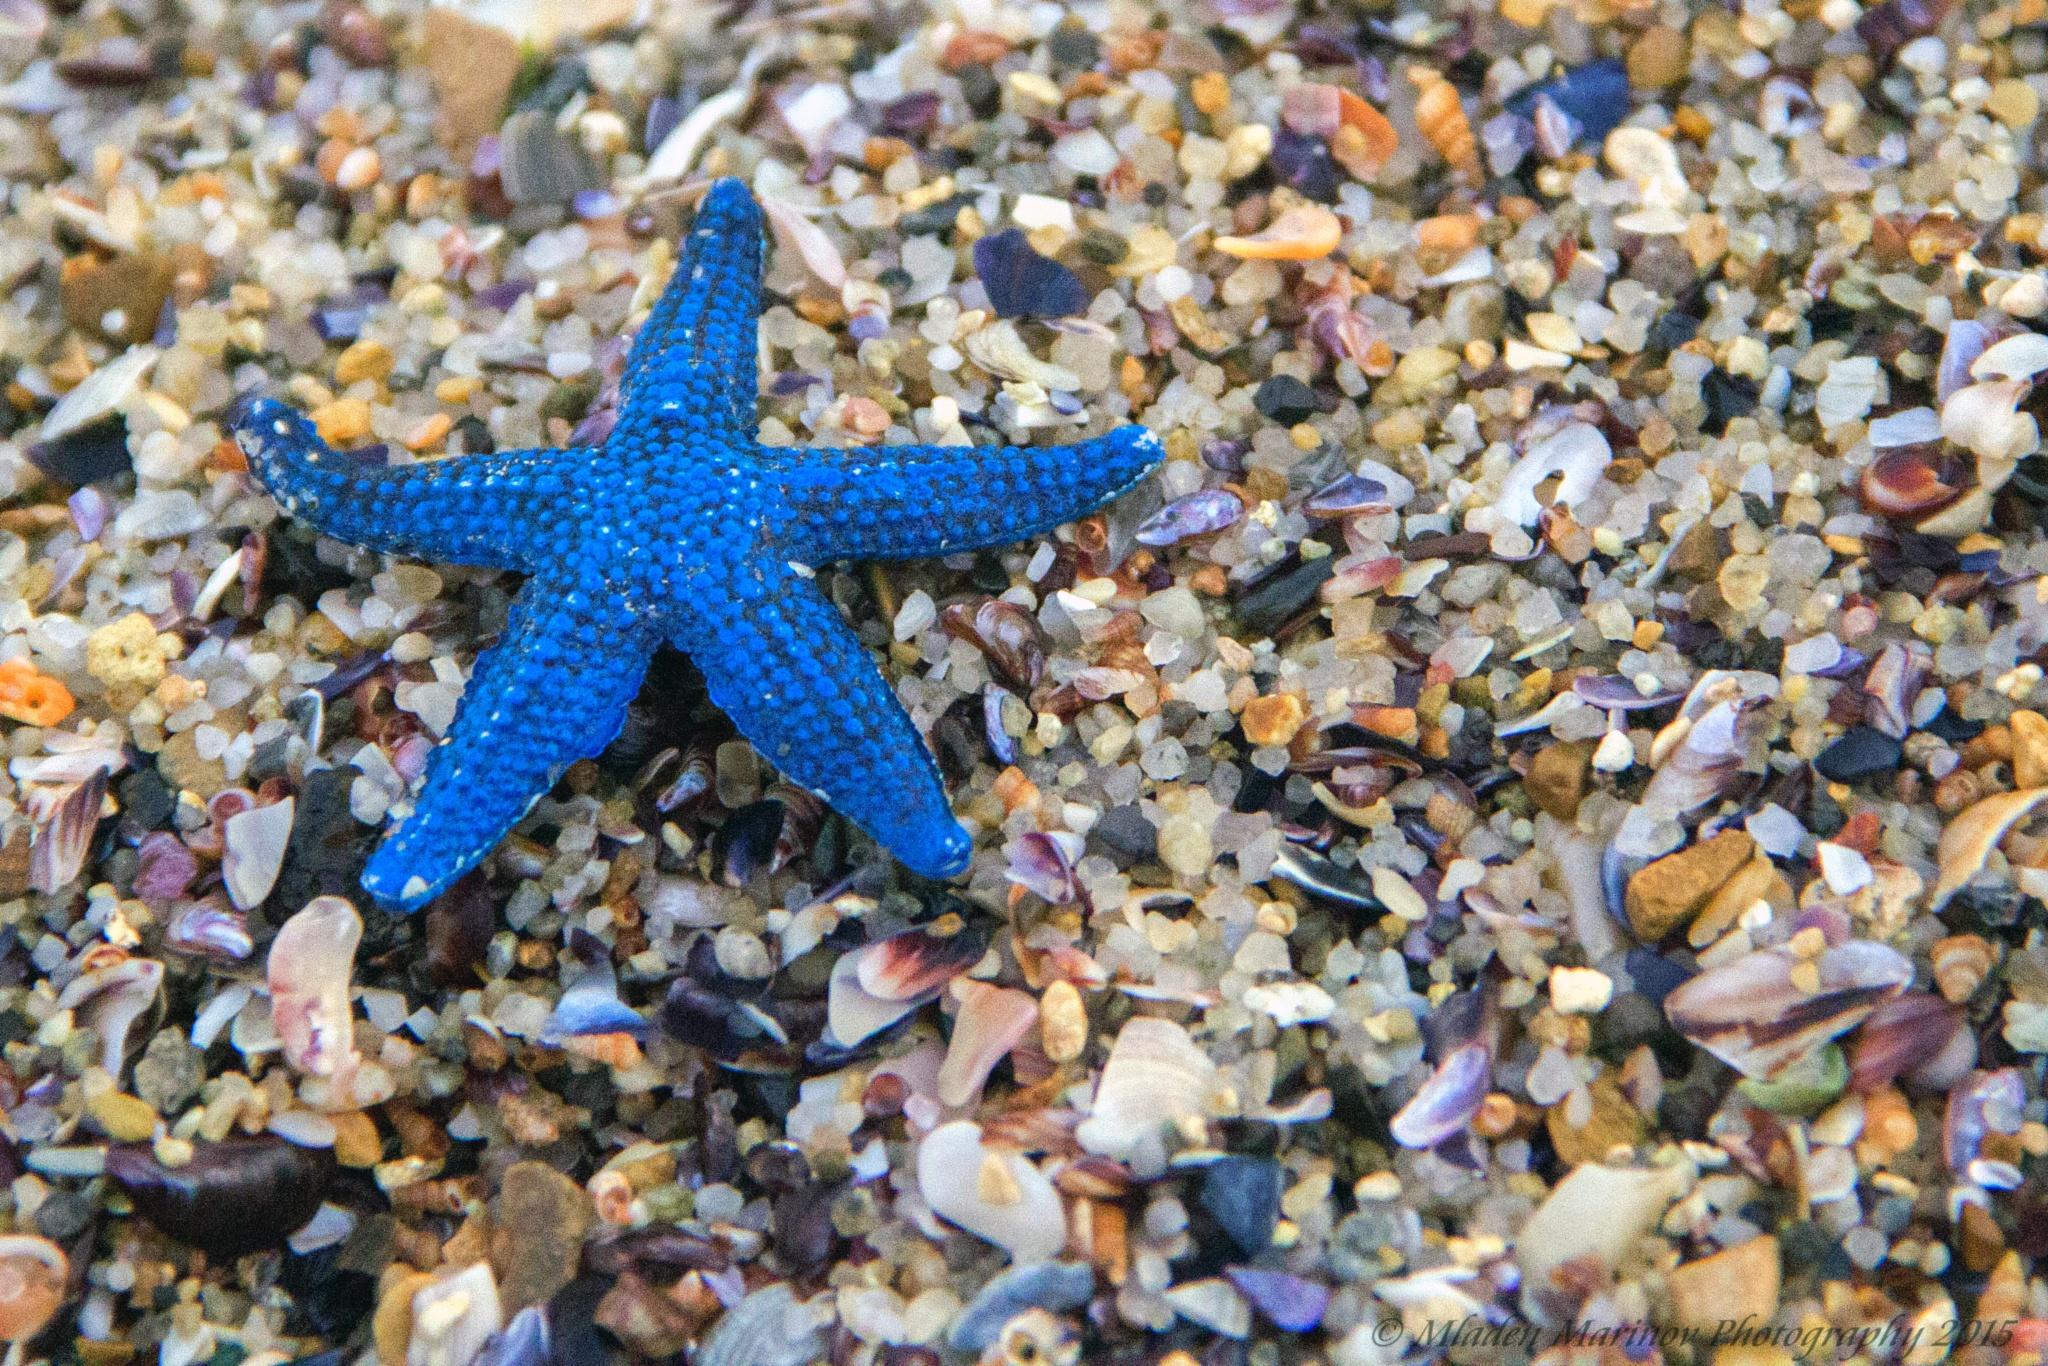 Blue Star by Mladen Marinov (MM)